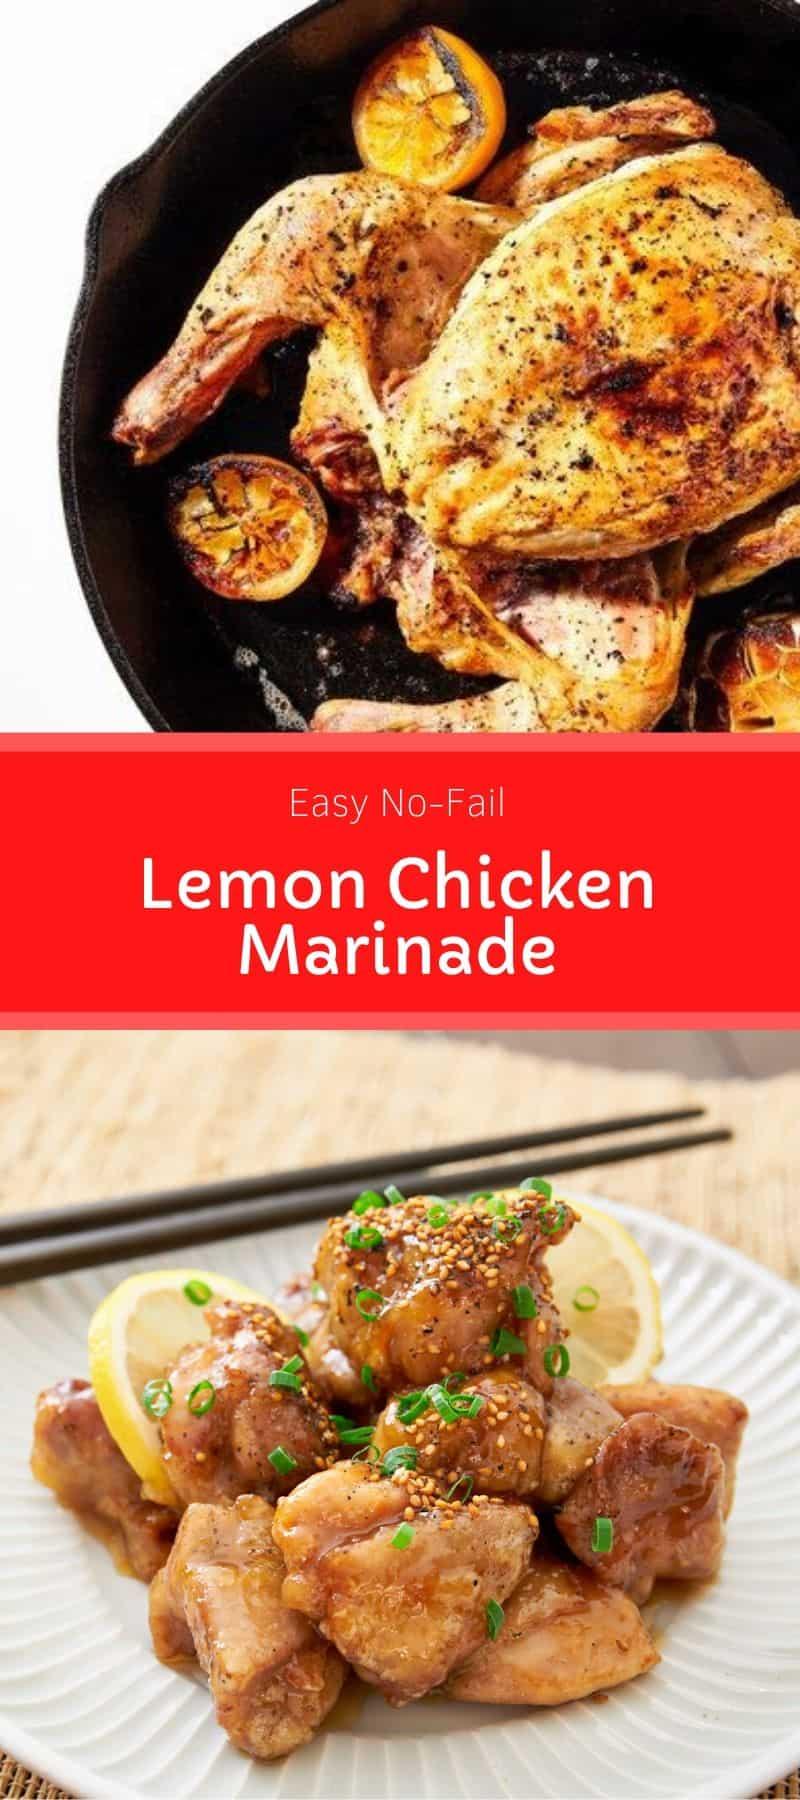 Easy No-Fail Lemon Chicken Marinade 3